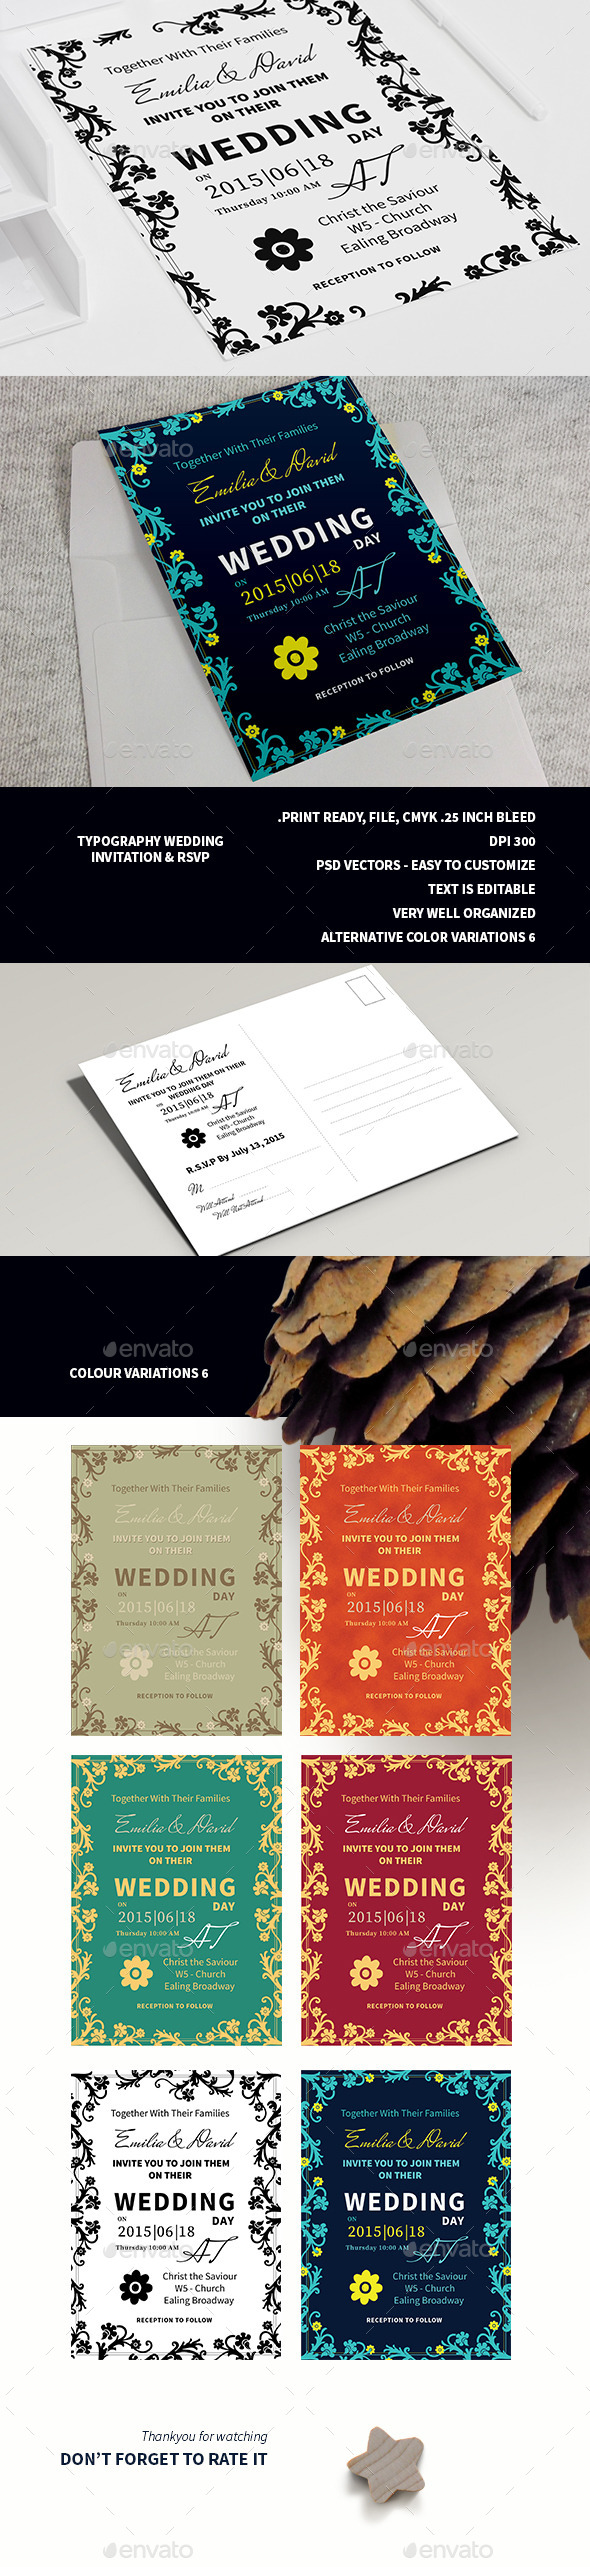 Typography Wedding Invitation & RSVP